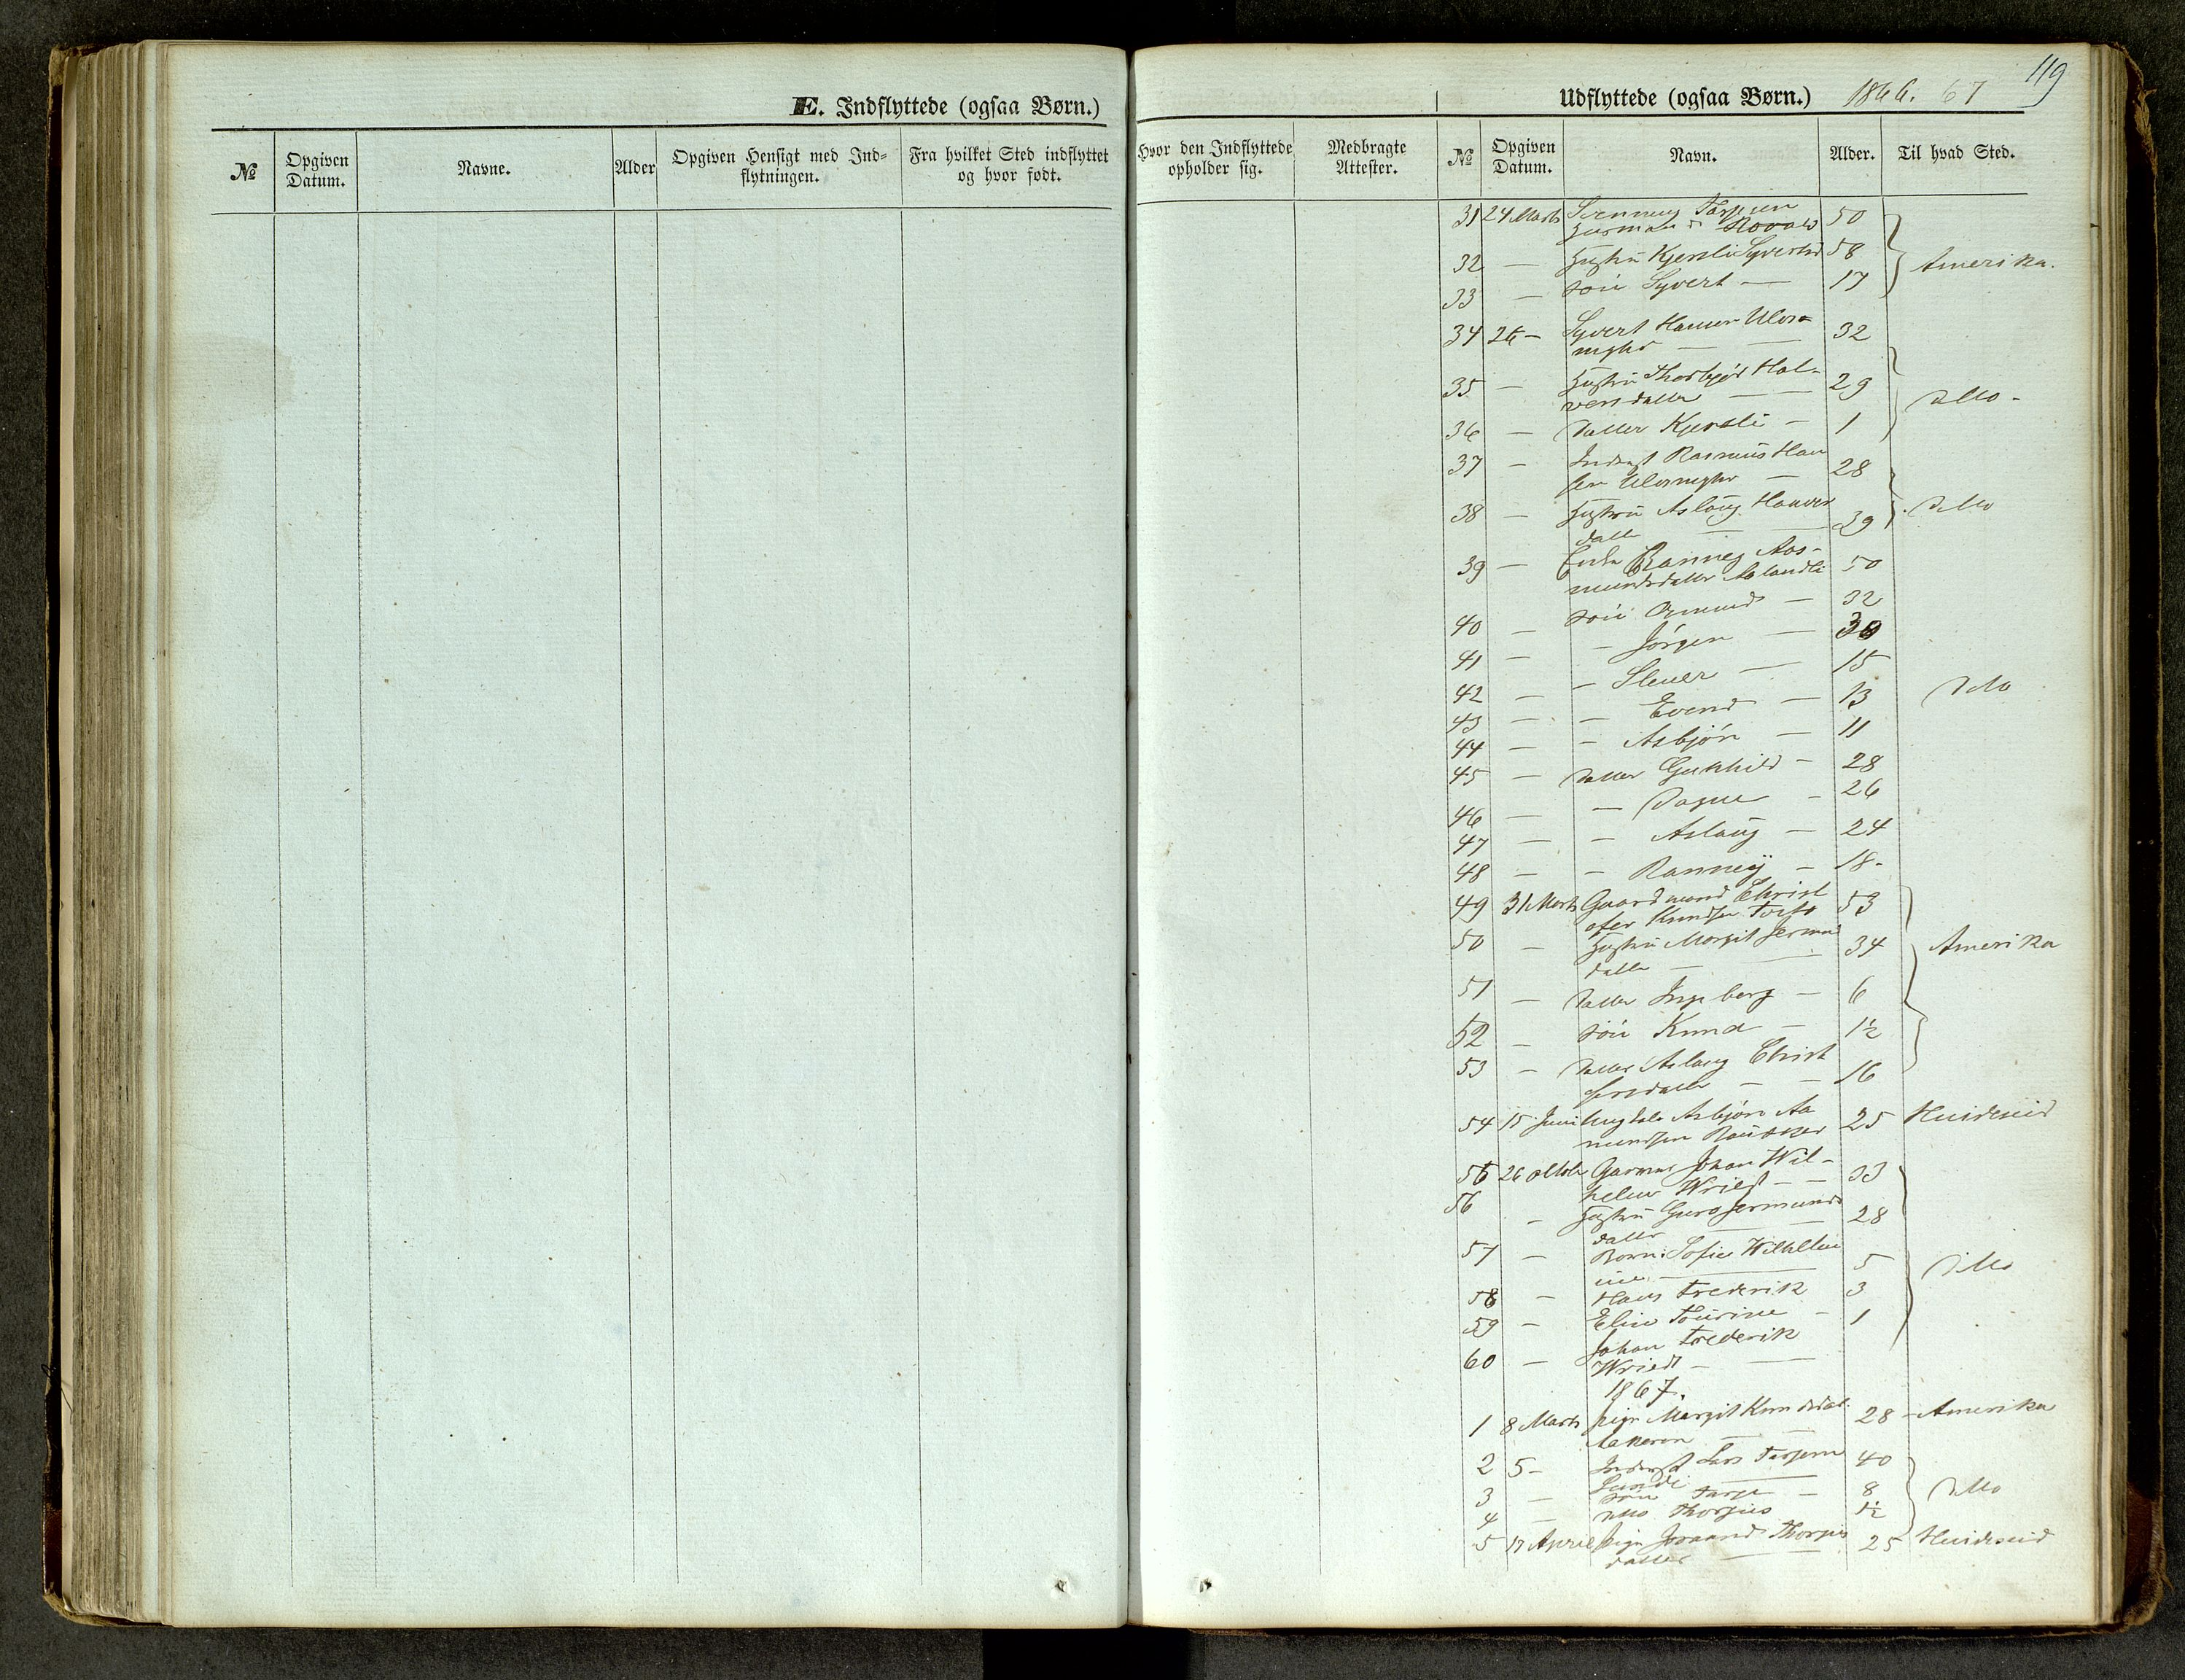 SAKO, Lårdal kirkebøker, G/Ga/L0002: Klokkerbok nr. I 2, 1861-1890, s. 119